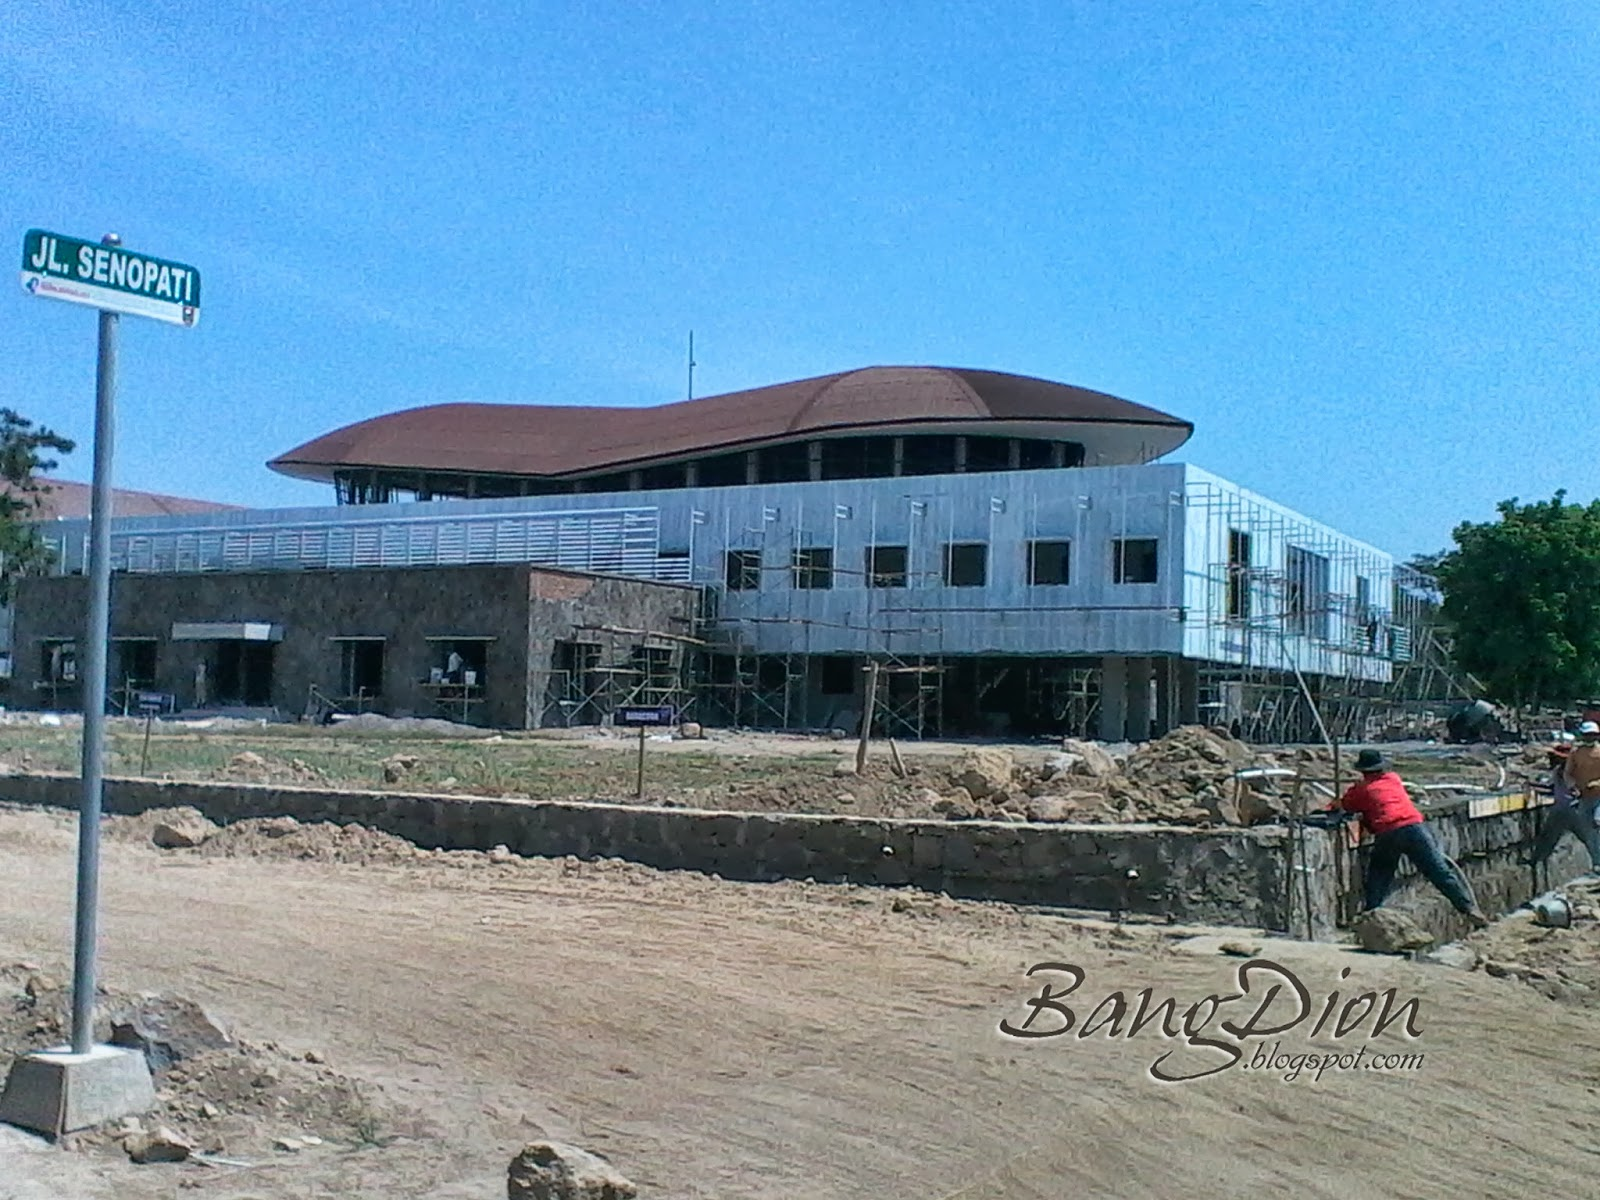 Kantor Baru Pemkab Boyolali, gedung pemkab boyolali yang baru, gedung baru pemkab boyolali, boyolali, gedung, pemkab, baru, gedung baru kabupaten boyolali, boyolali, kabupaten boyolali